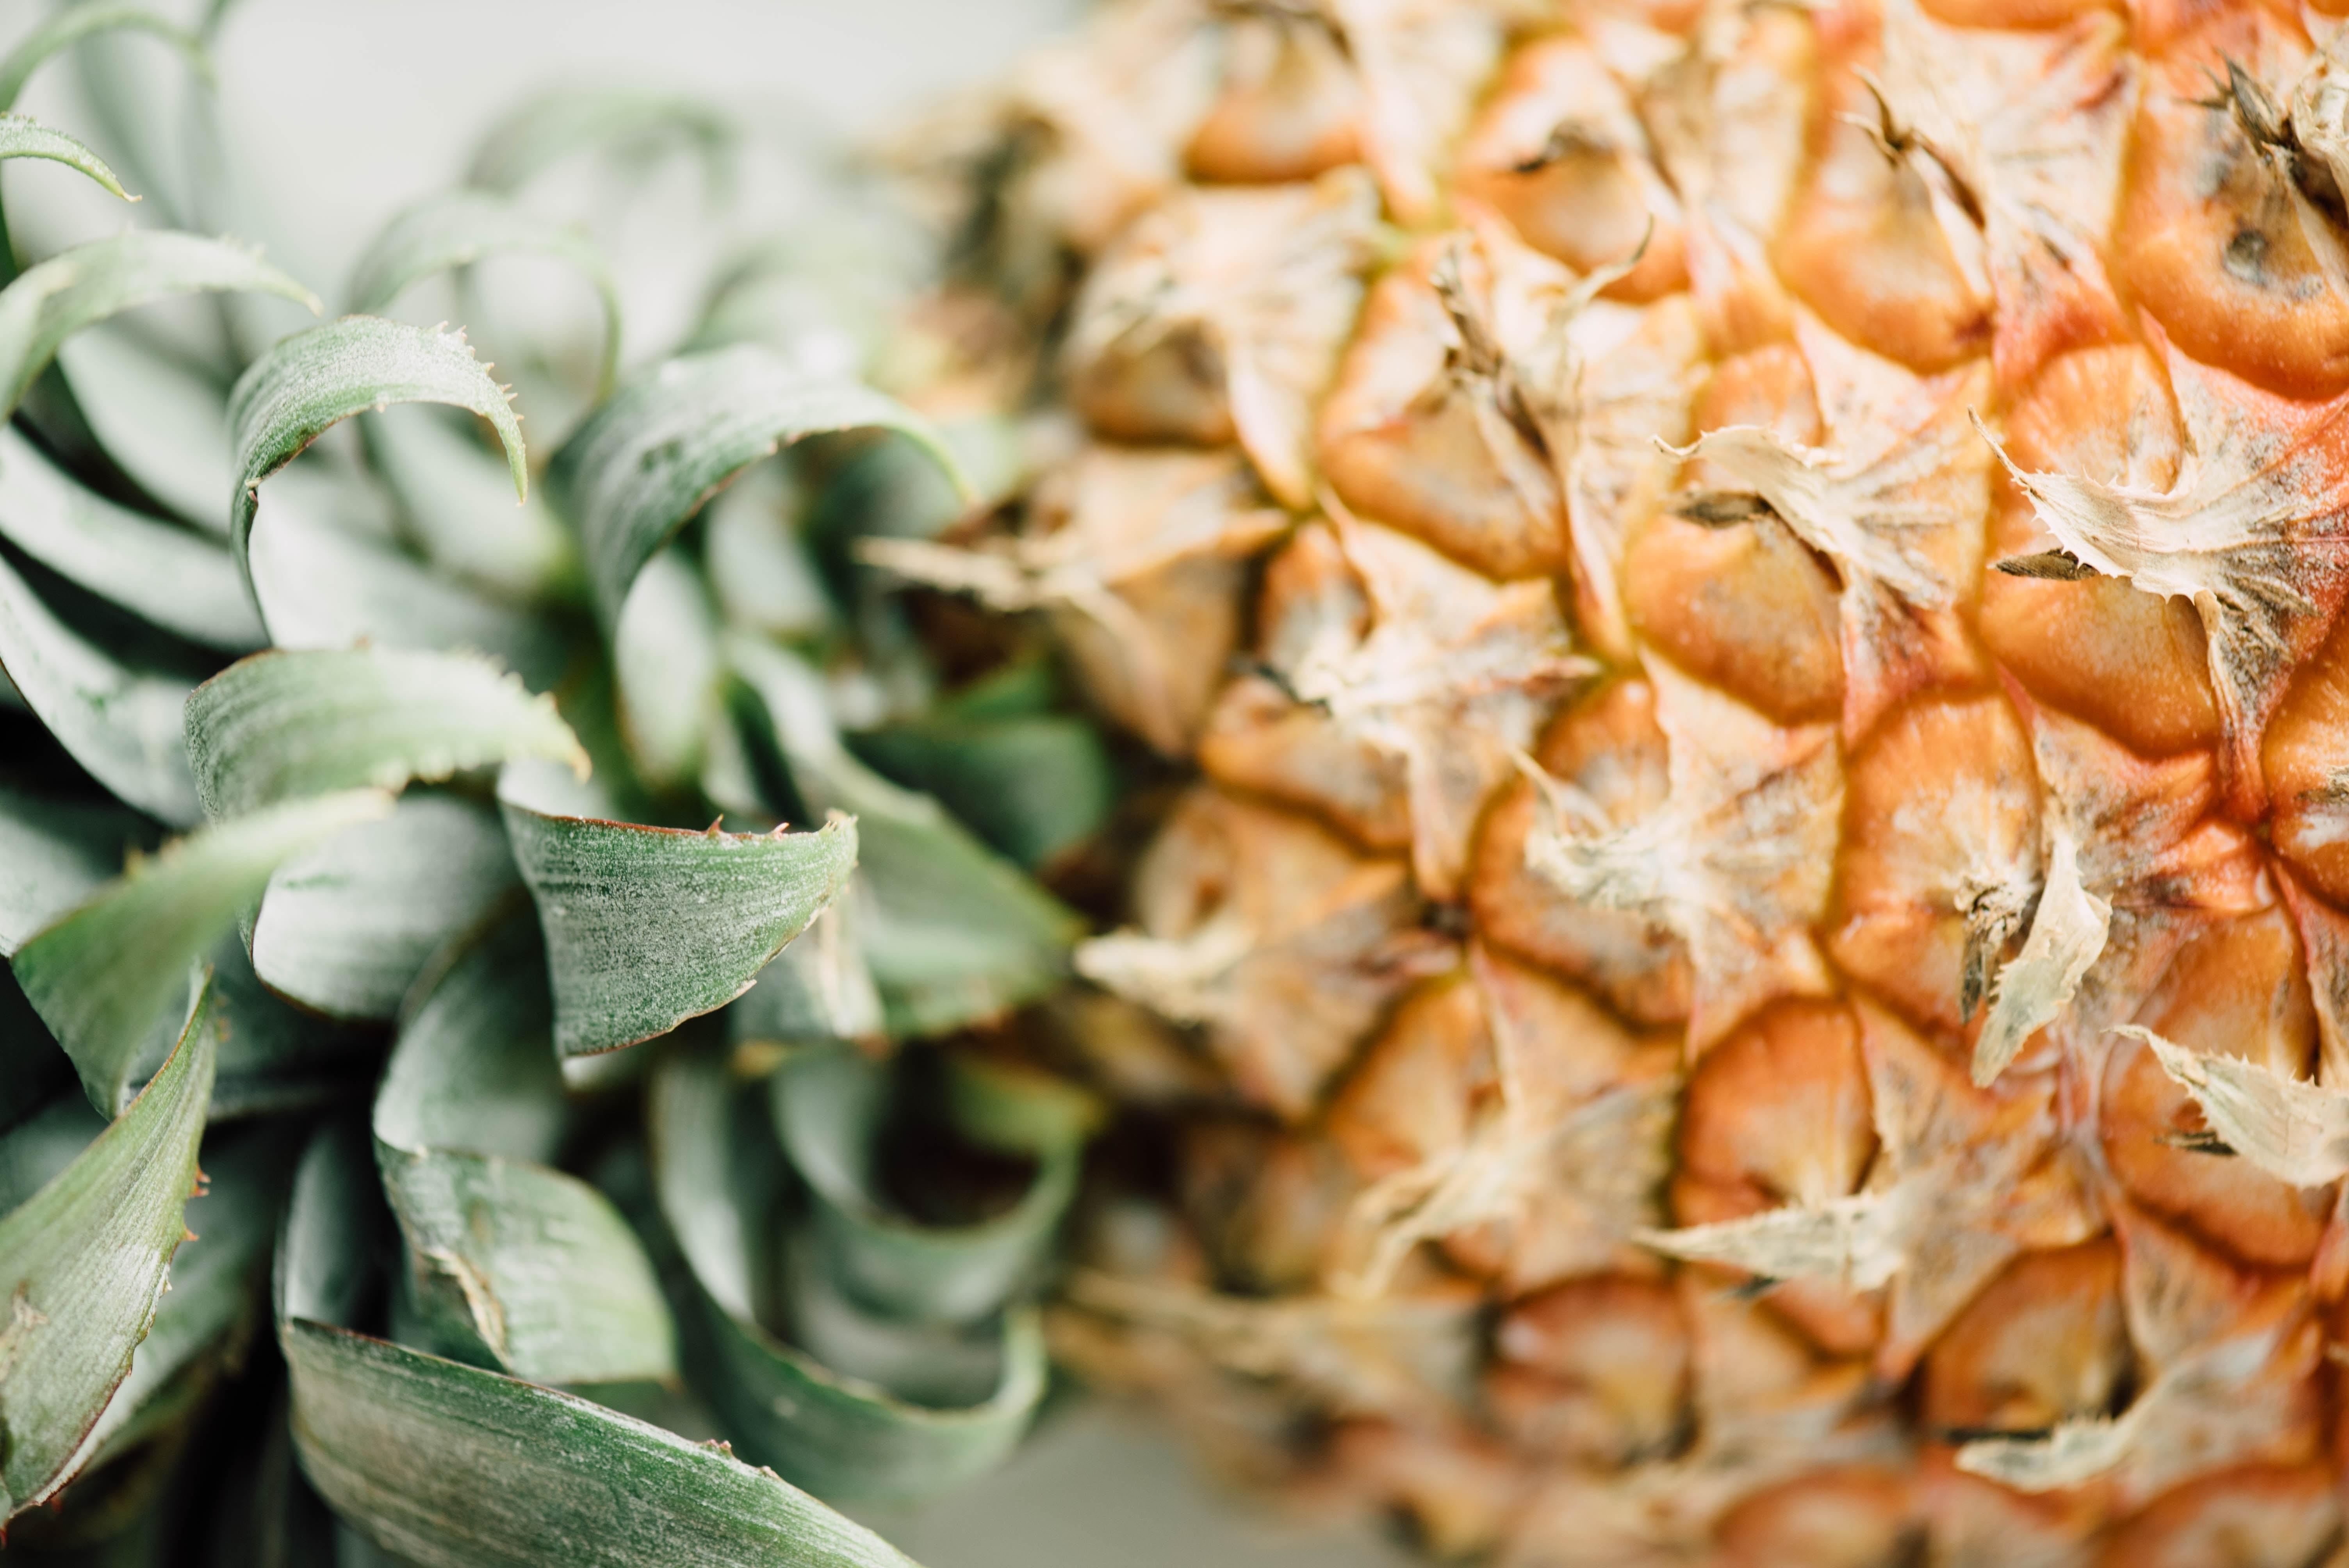 Macro shot of a pineapple lying down.